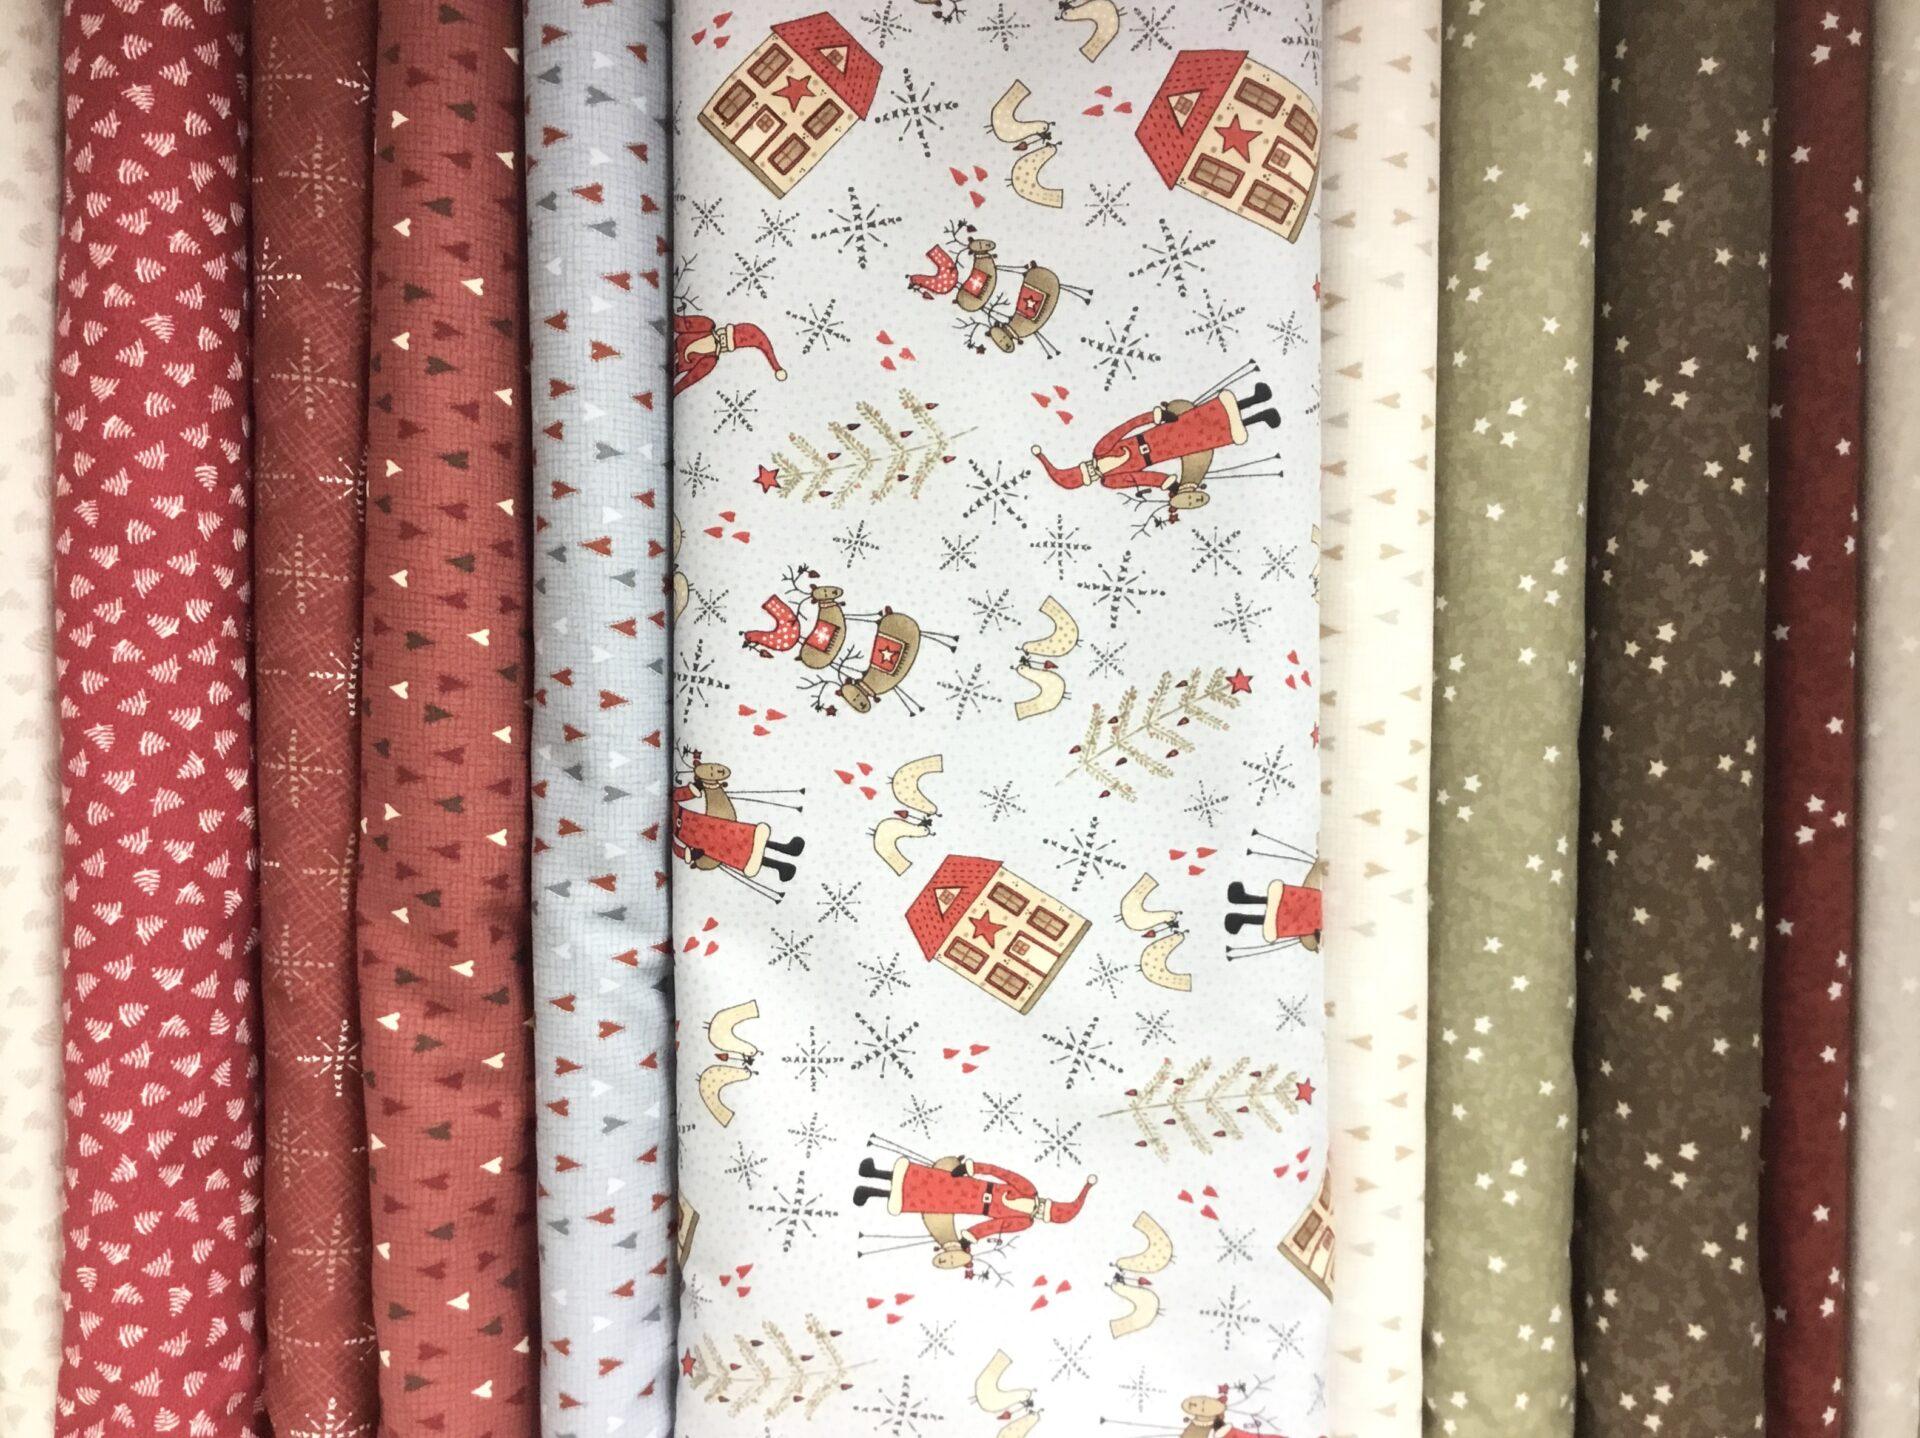 Lynette Anderson's Scandinavian Christmas